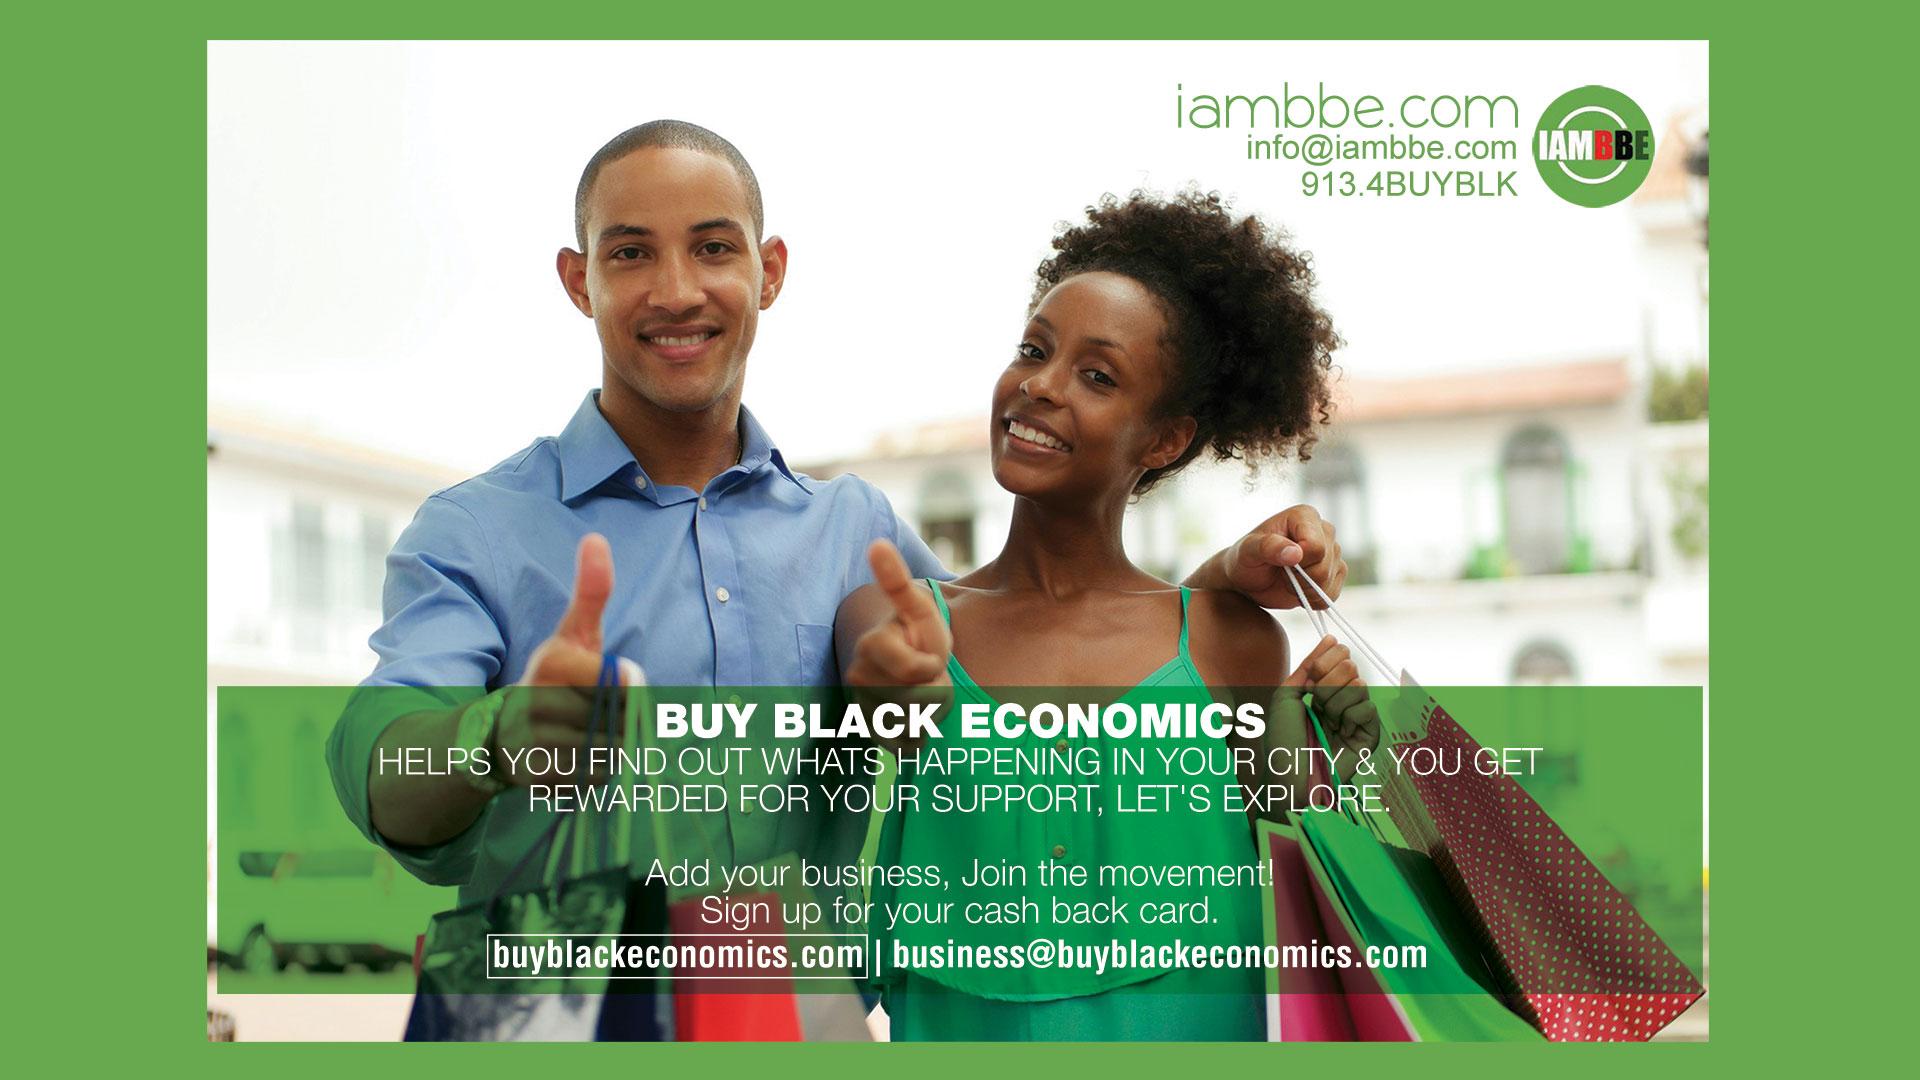 buyblackeconomics